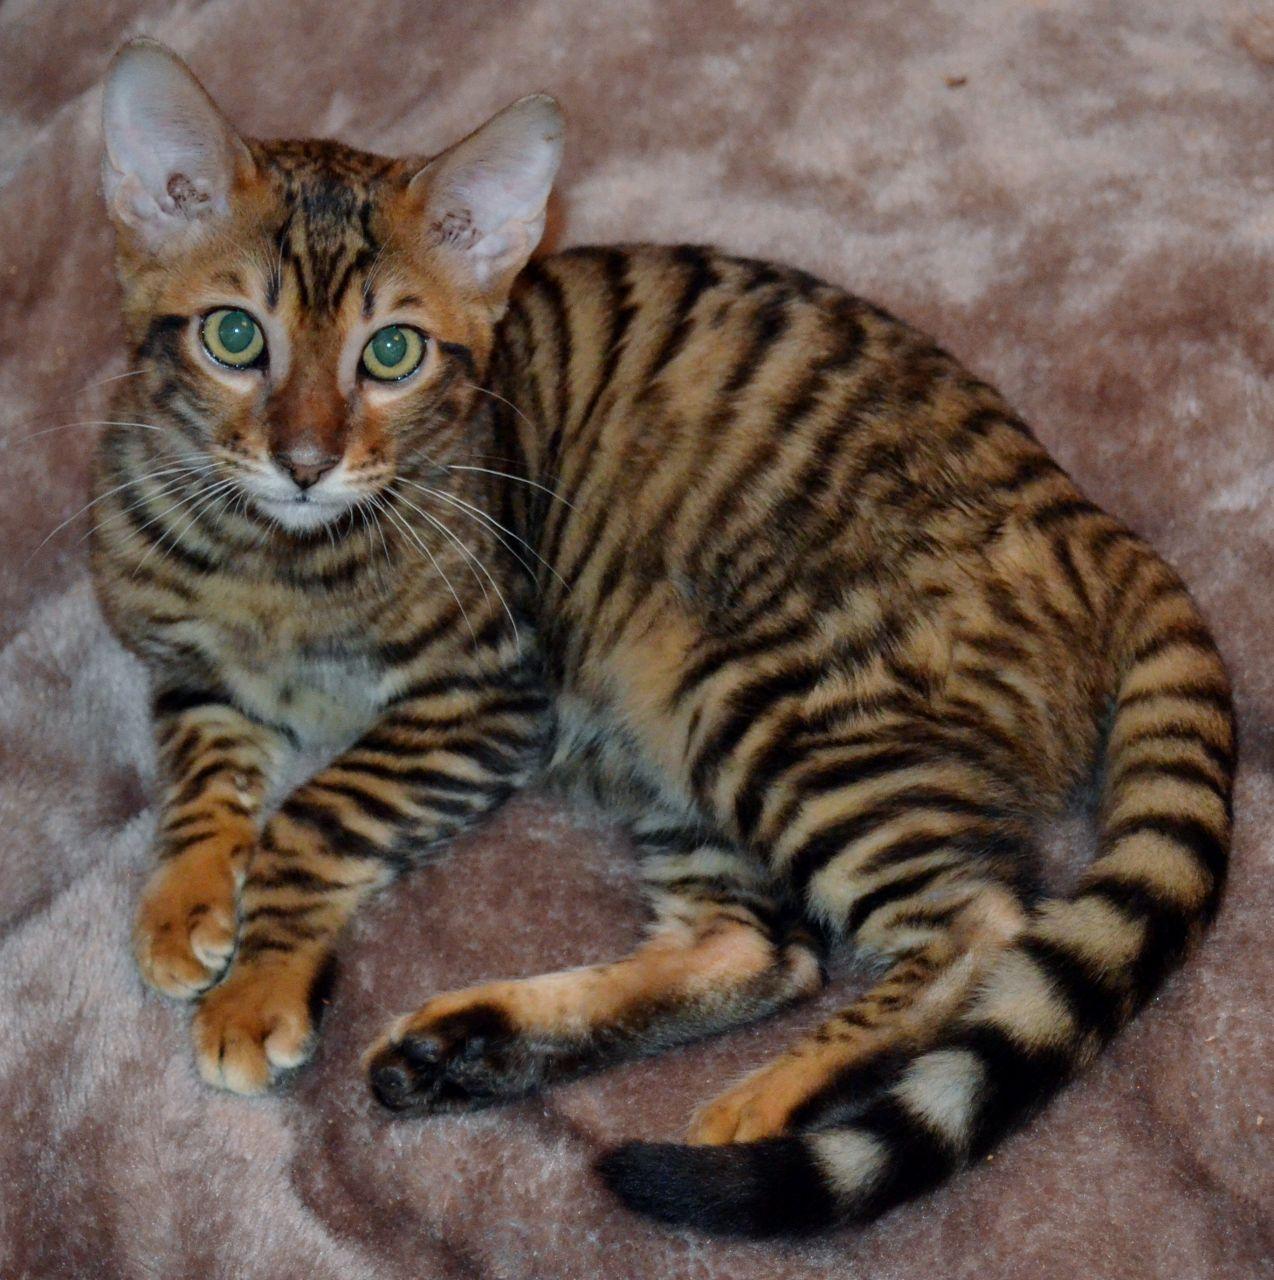 Toyger Kitten: Toyger Toyger Kittens Price Breed